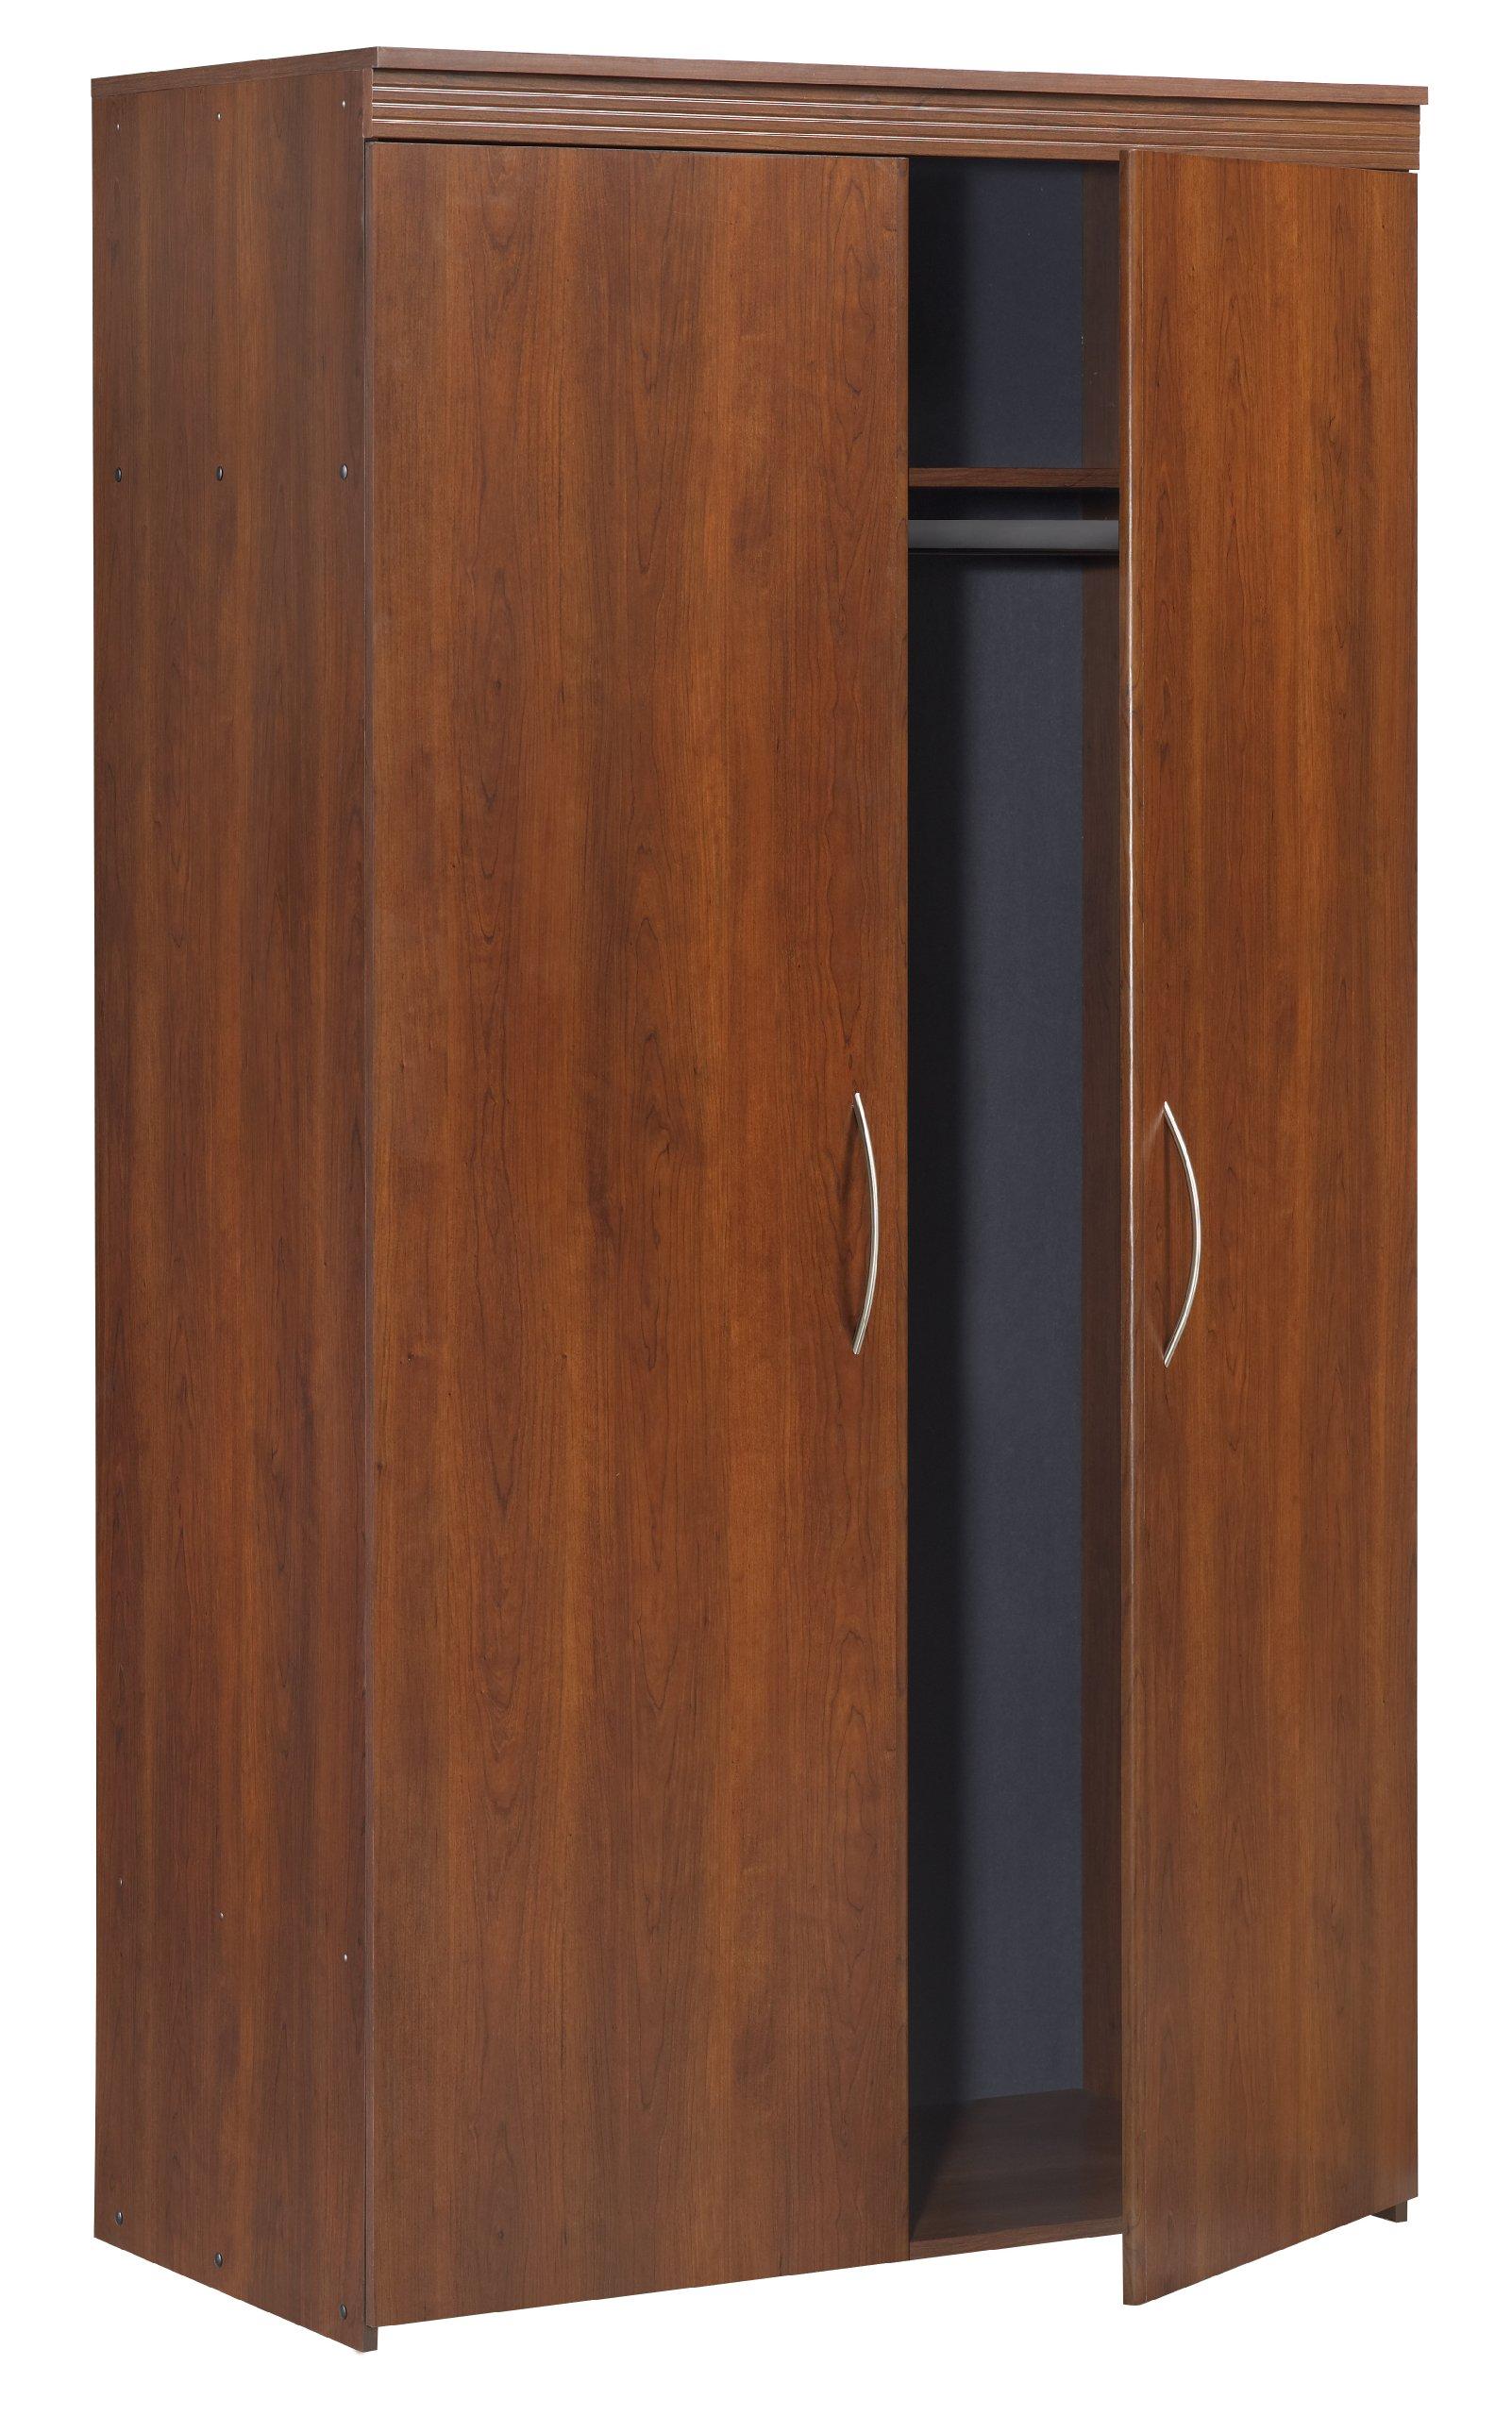 Black & Decker BS106173HH 2 Door Wardrobe with Decorative Moulding